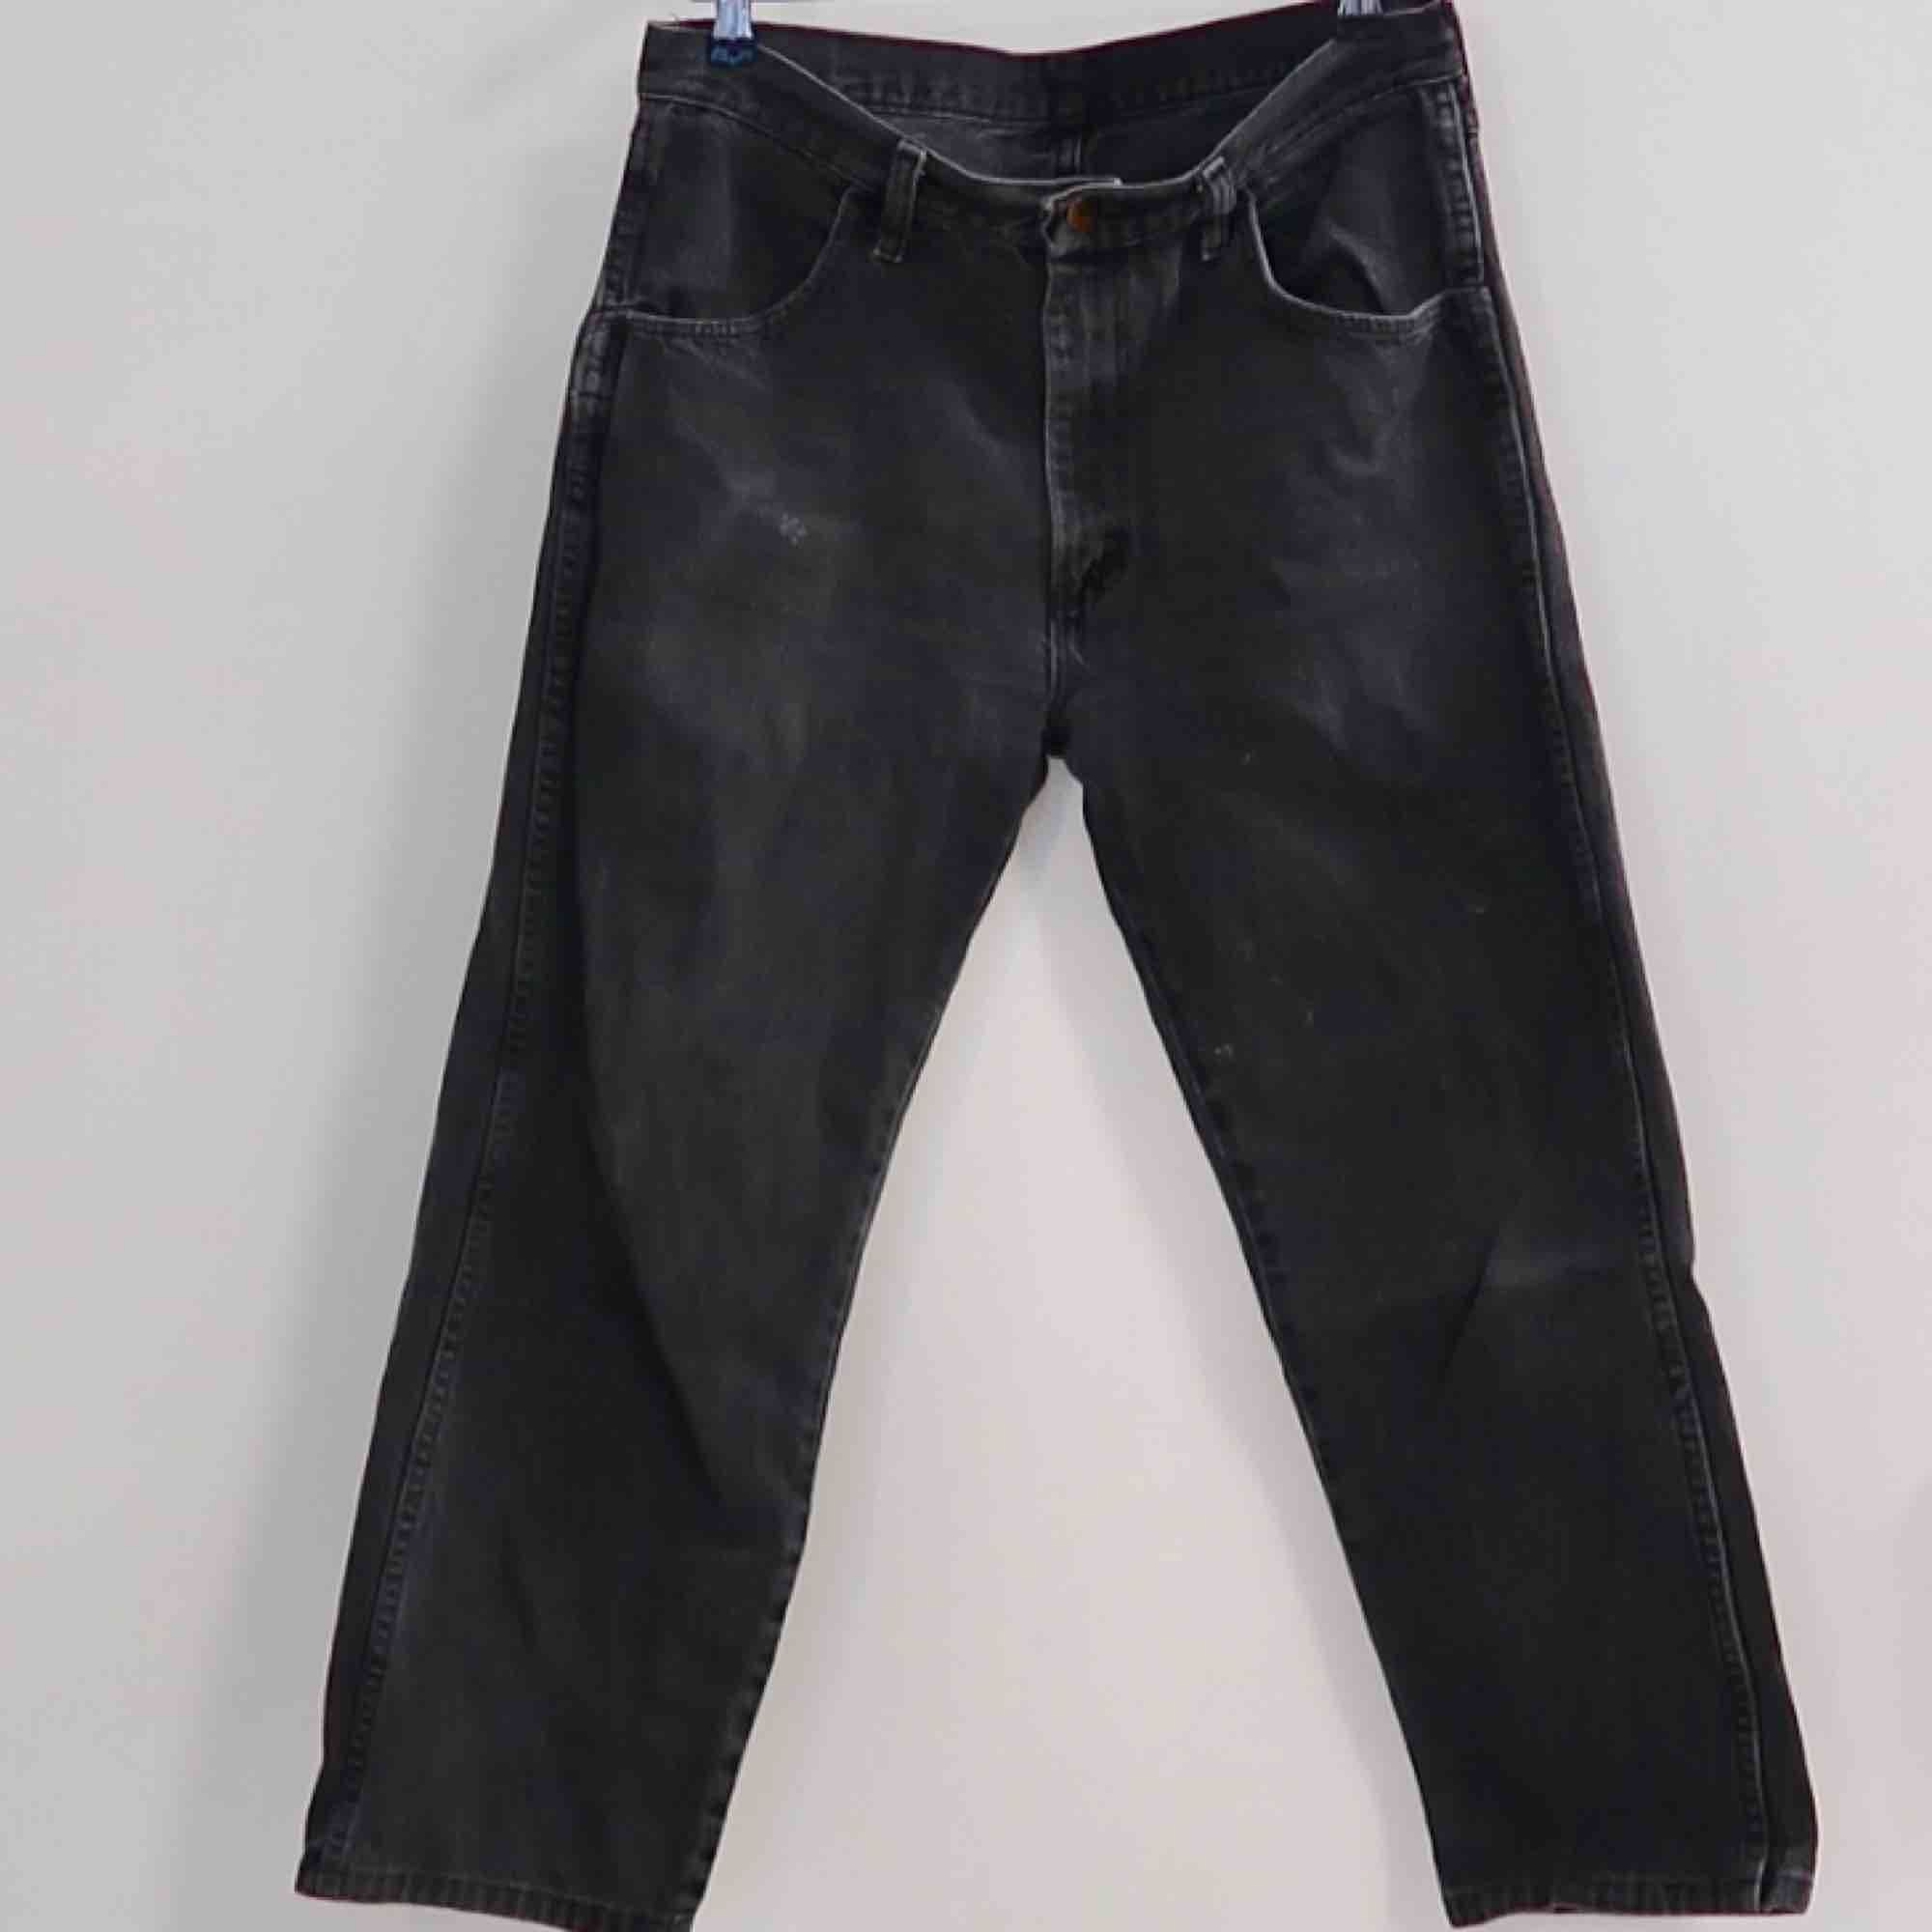 Secondhand Jeans i storlek W32 L32  (Passar mig som har storlek 38-40). Jeans & Byxor.